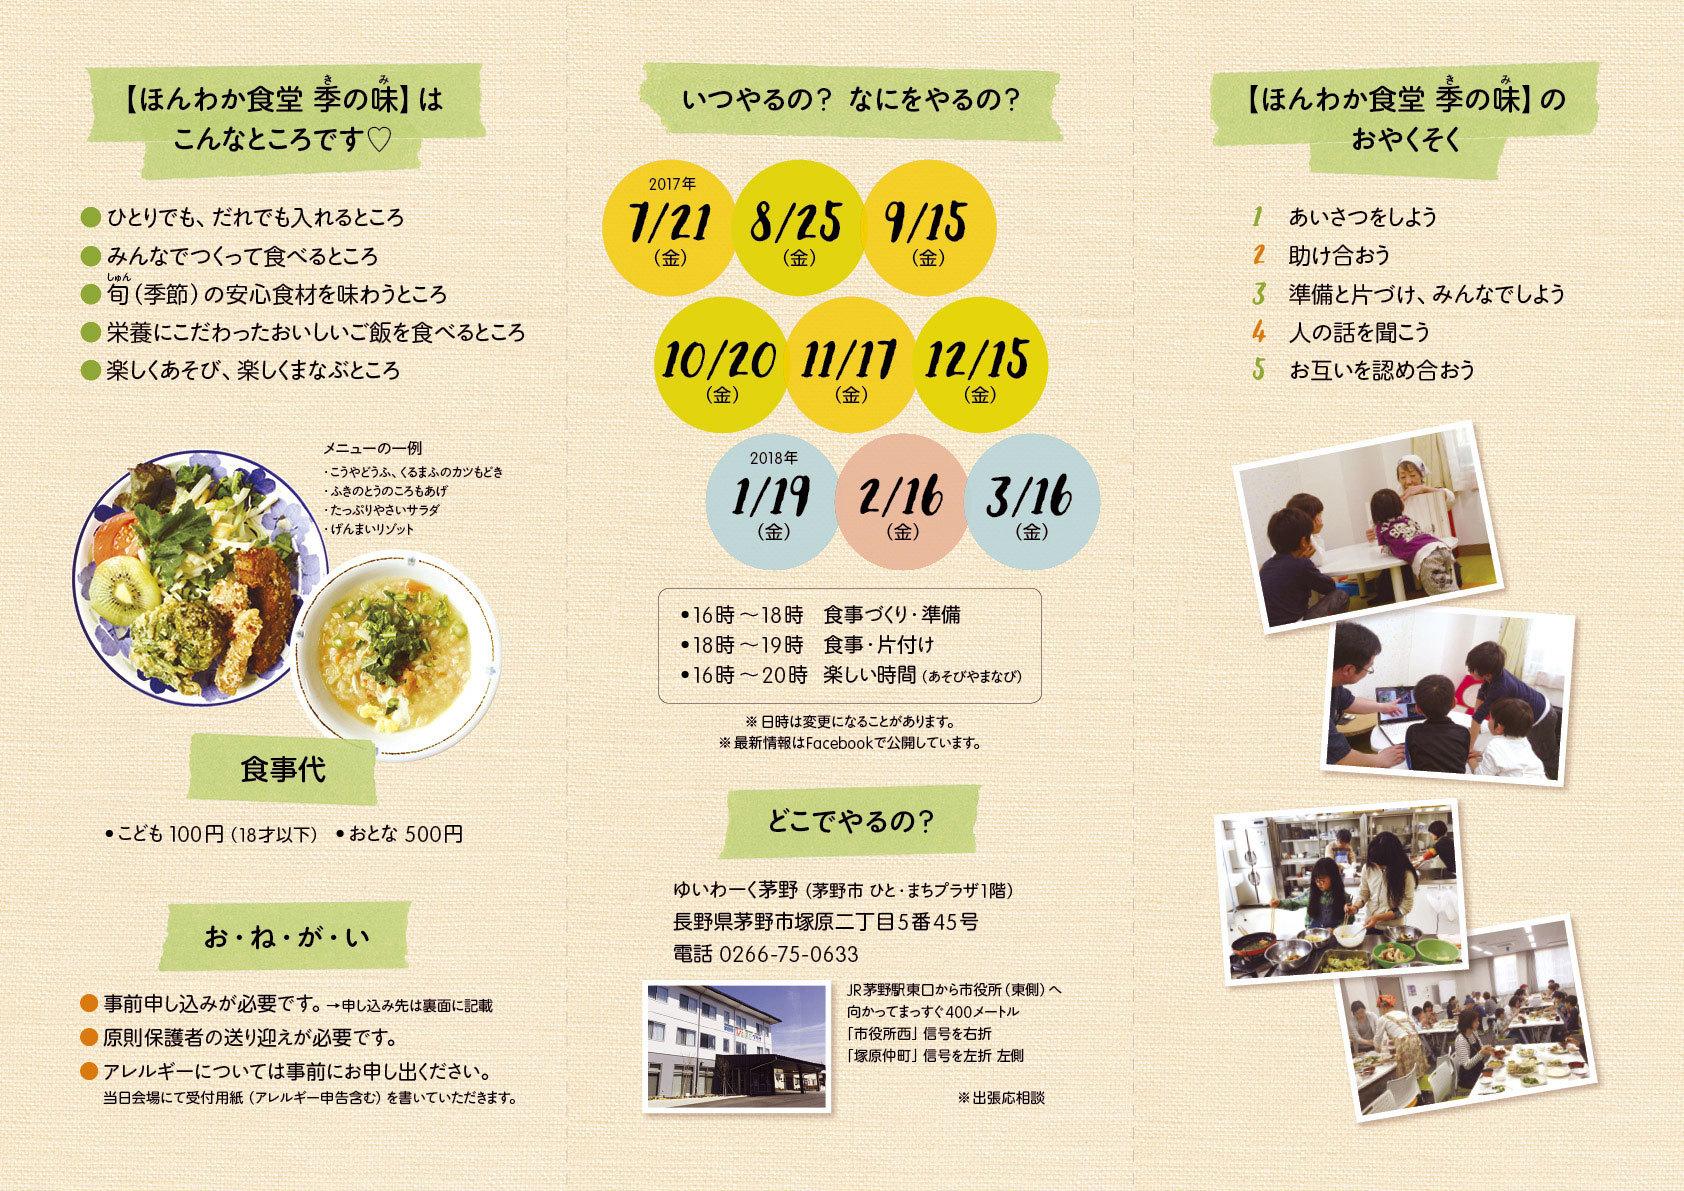 kinomi_leaf_2_naka.jpg